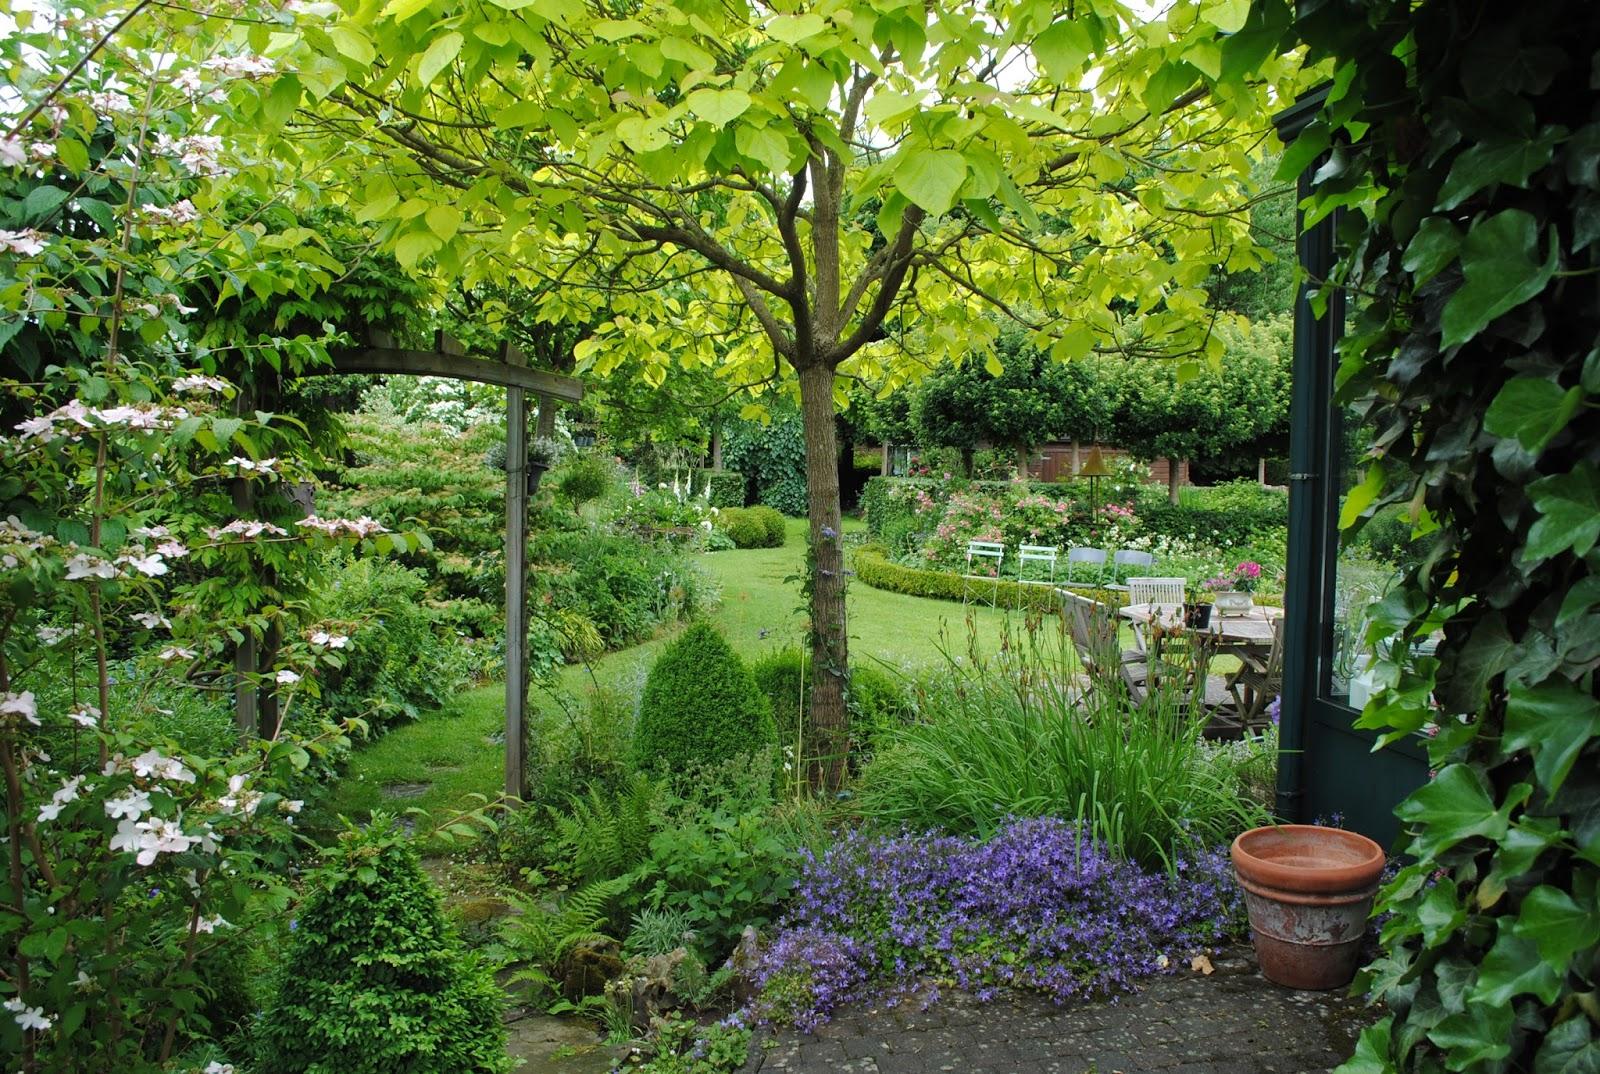 Arbre petit jardin arbre petit jardin une grosse souche for Arbre exterieur jardin